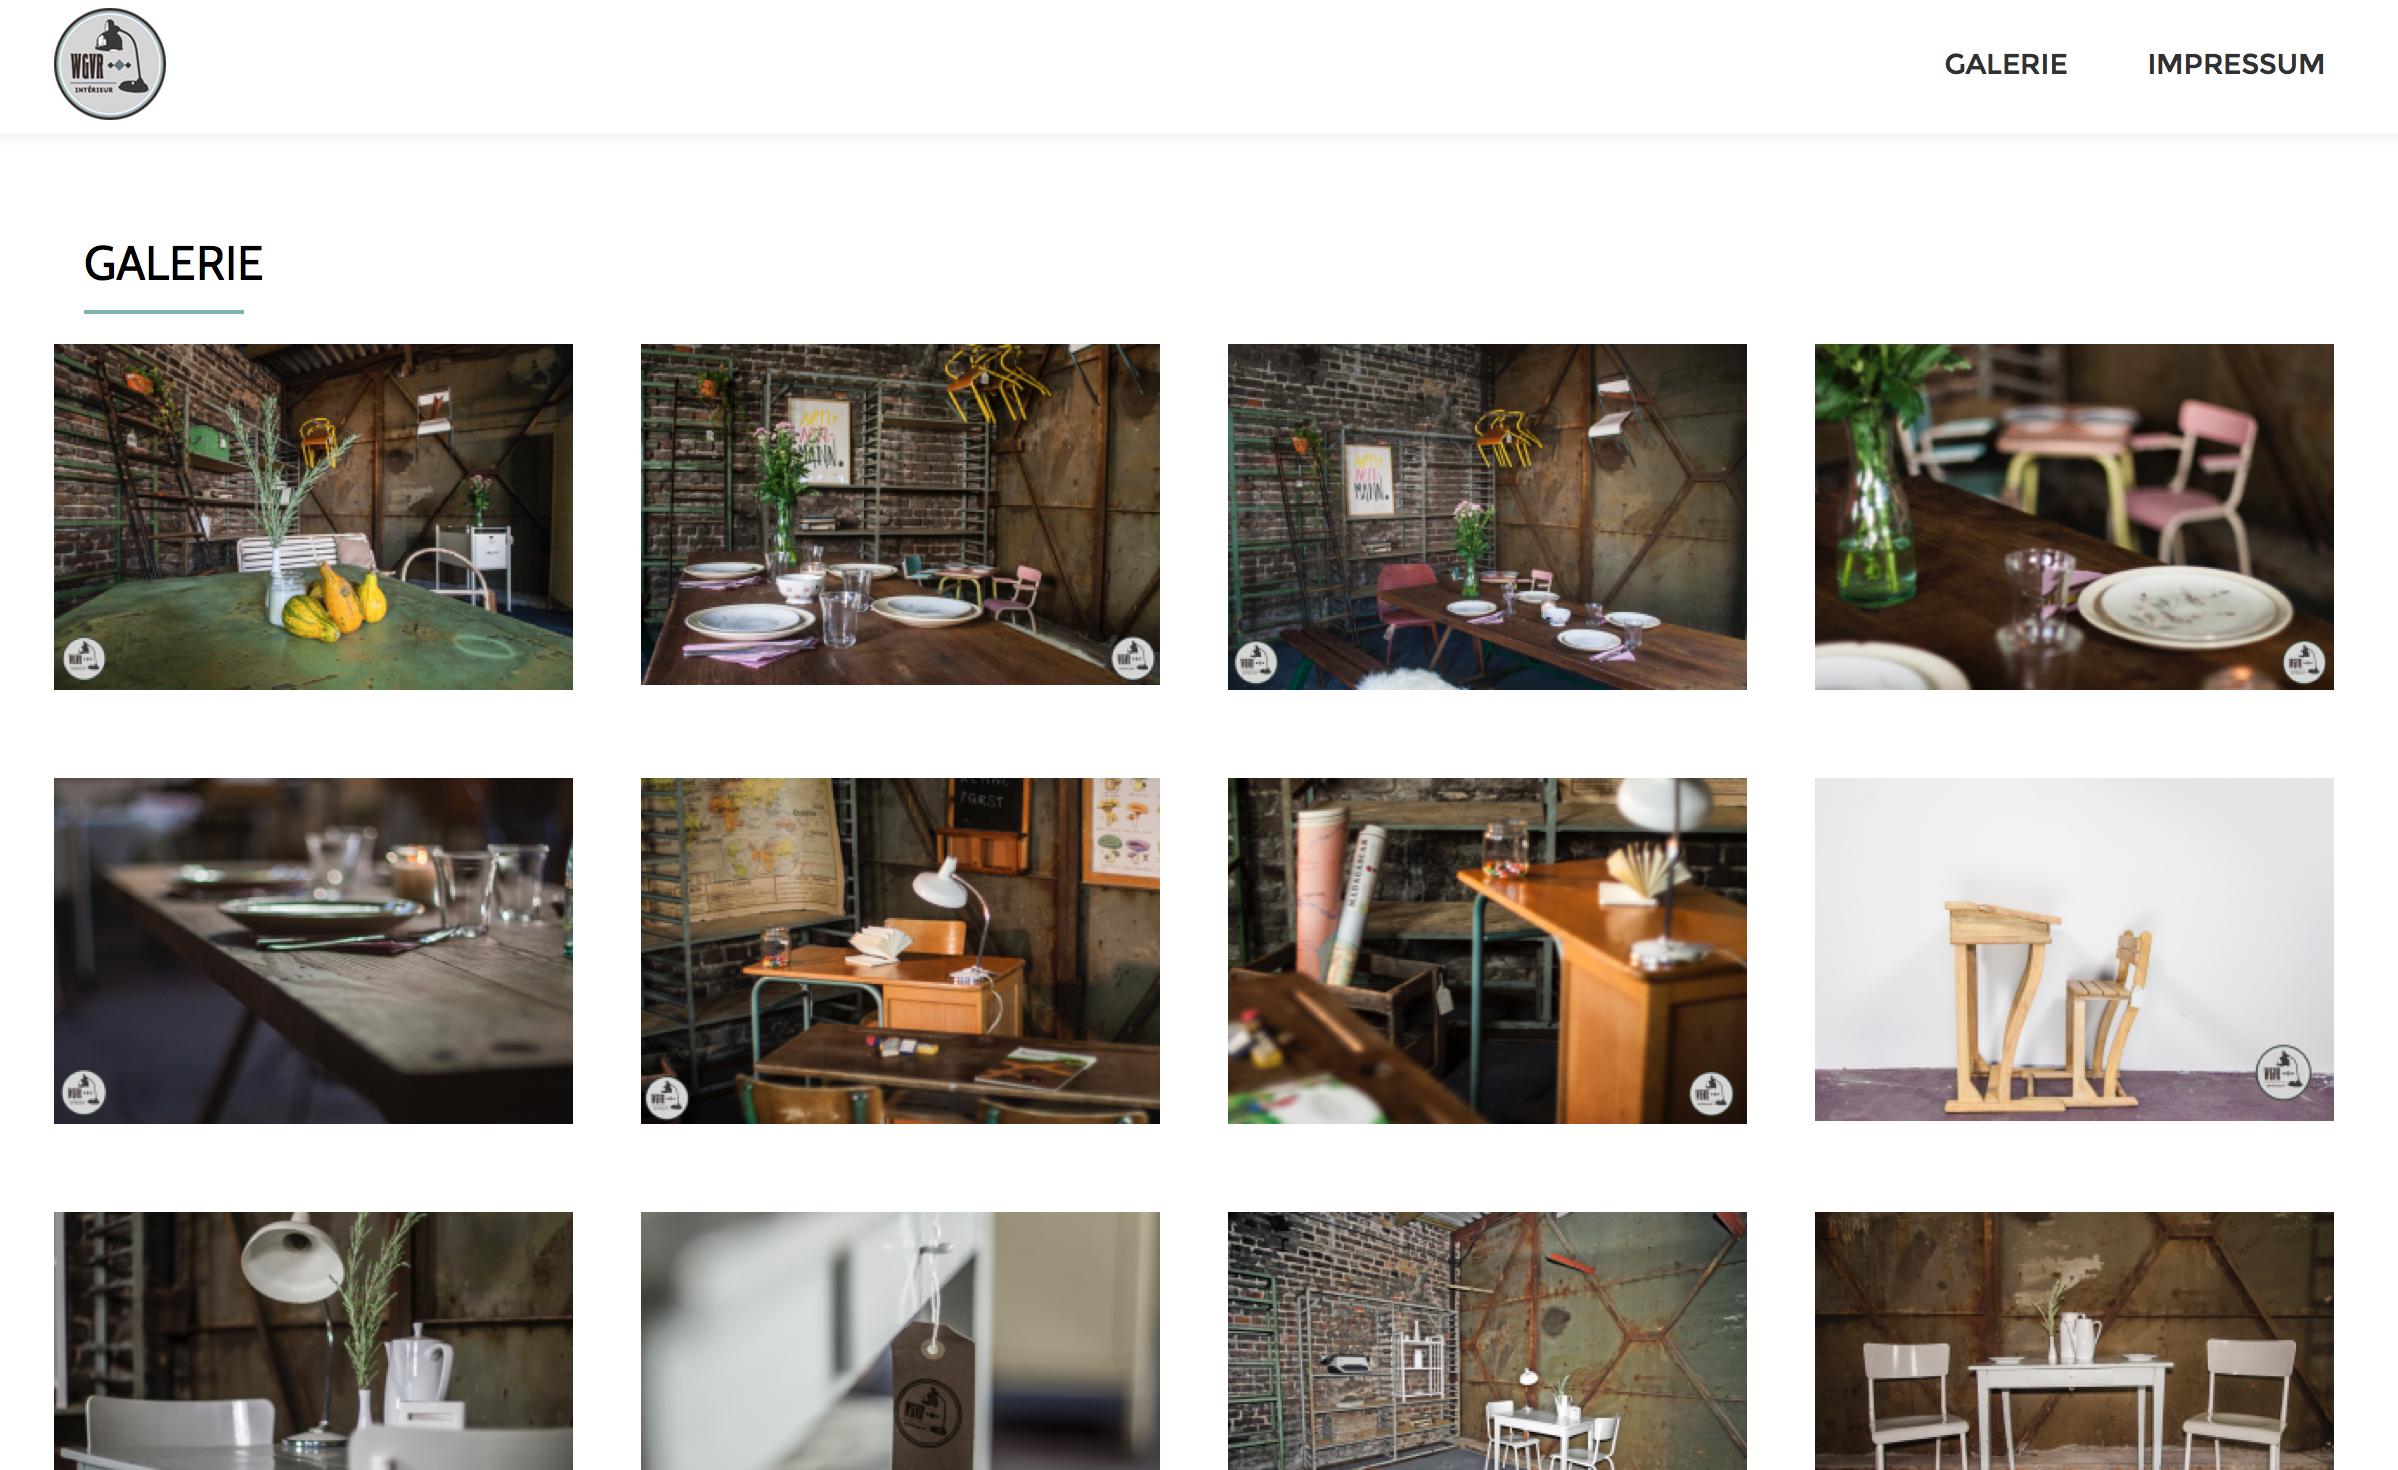 waage vier responsive webdesign portfolio High Res, galerie, parallax